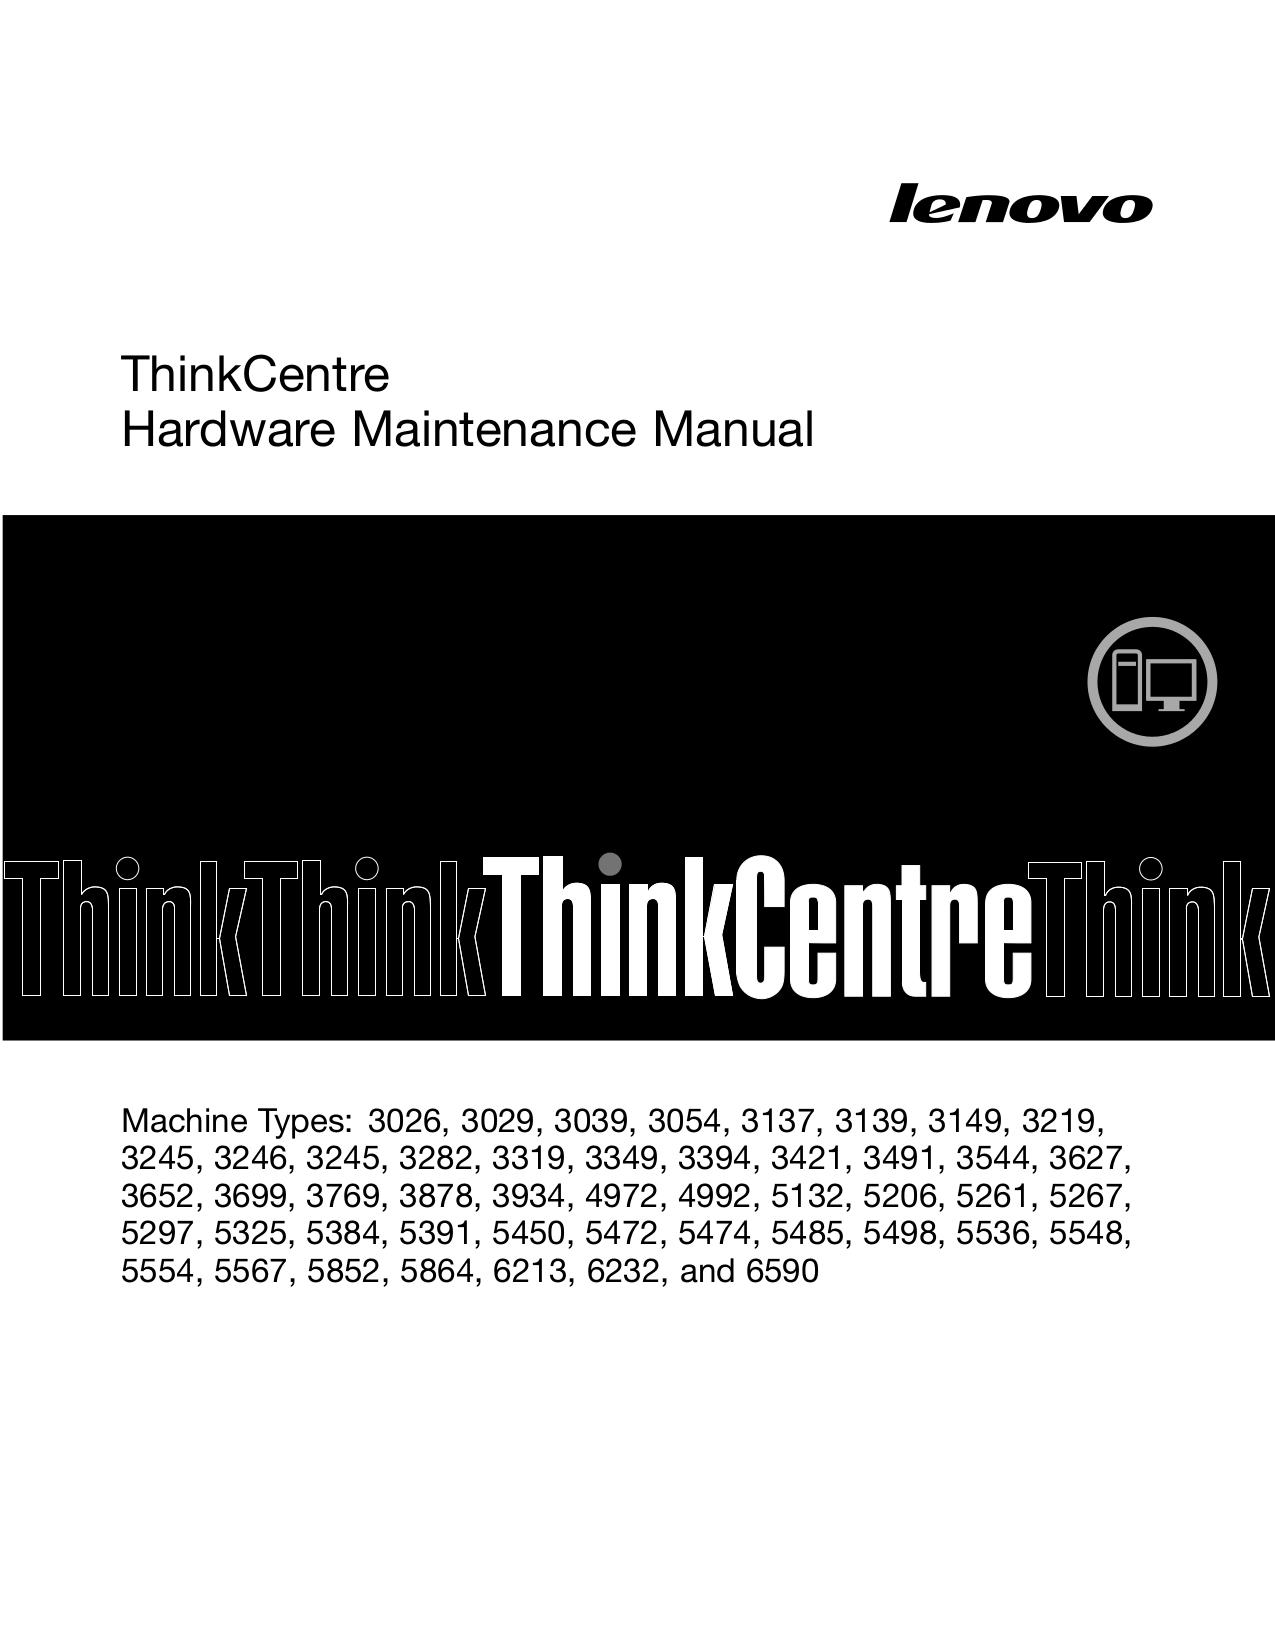 pdf for Lenovo Desktop ThinkCentre M90 5567 manual